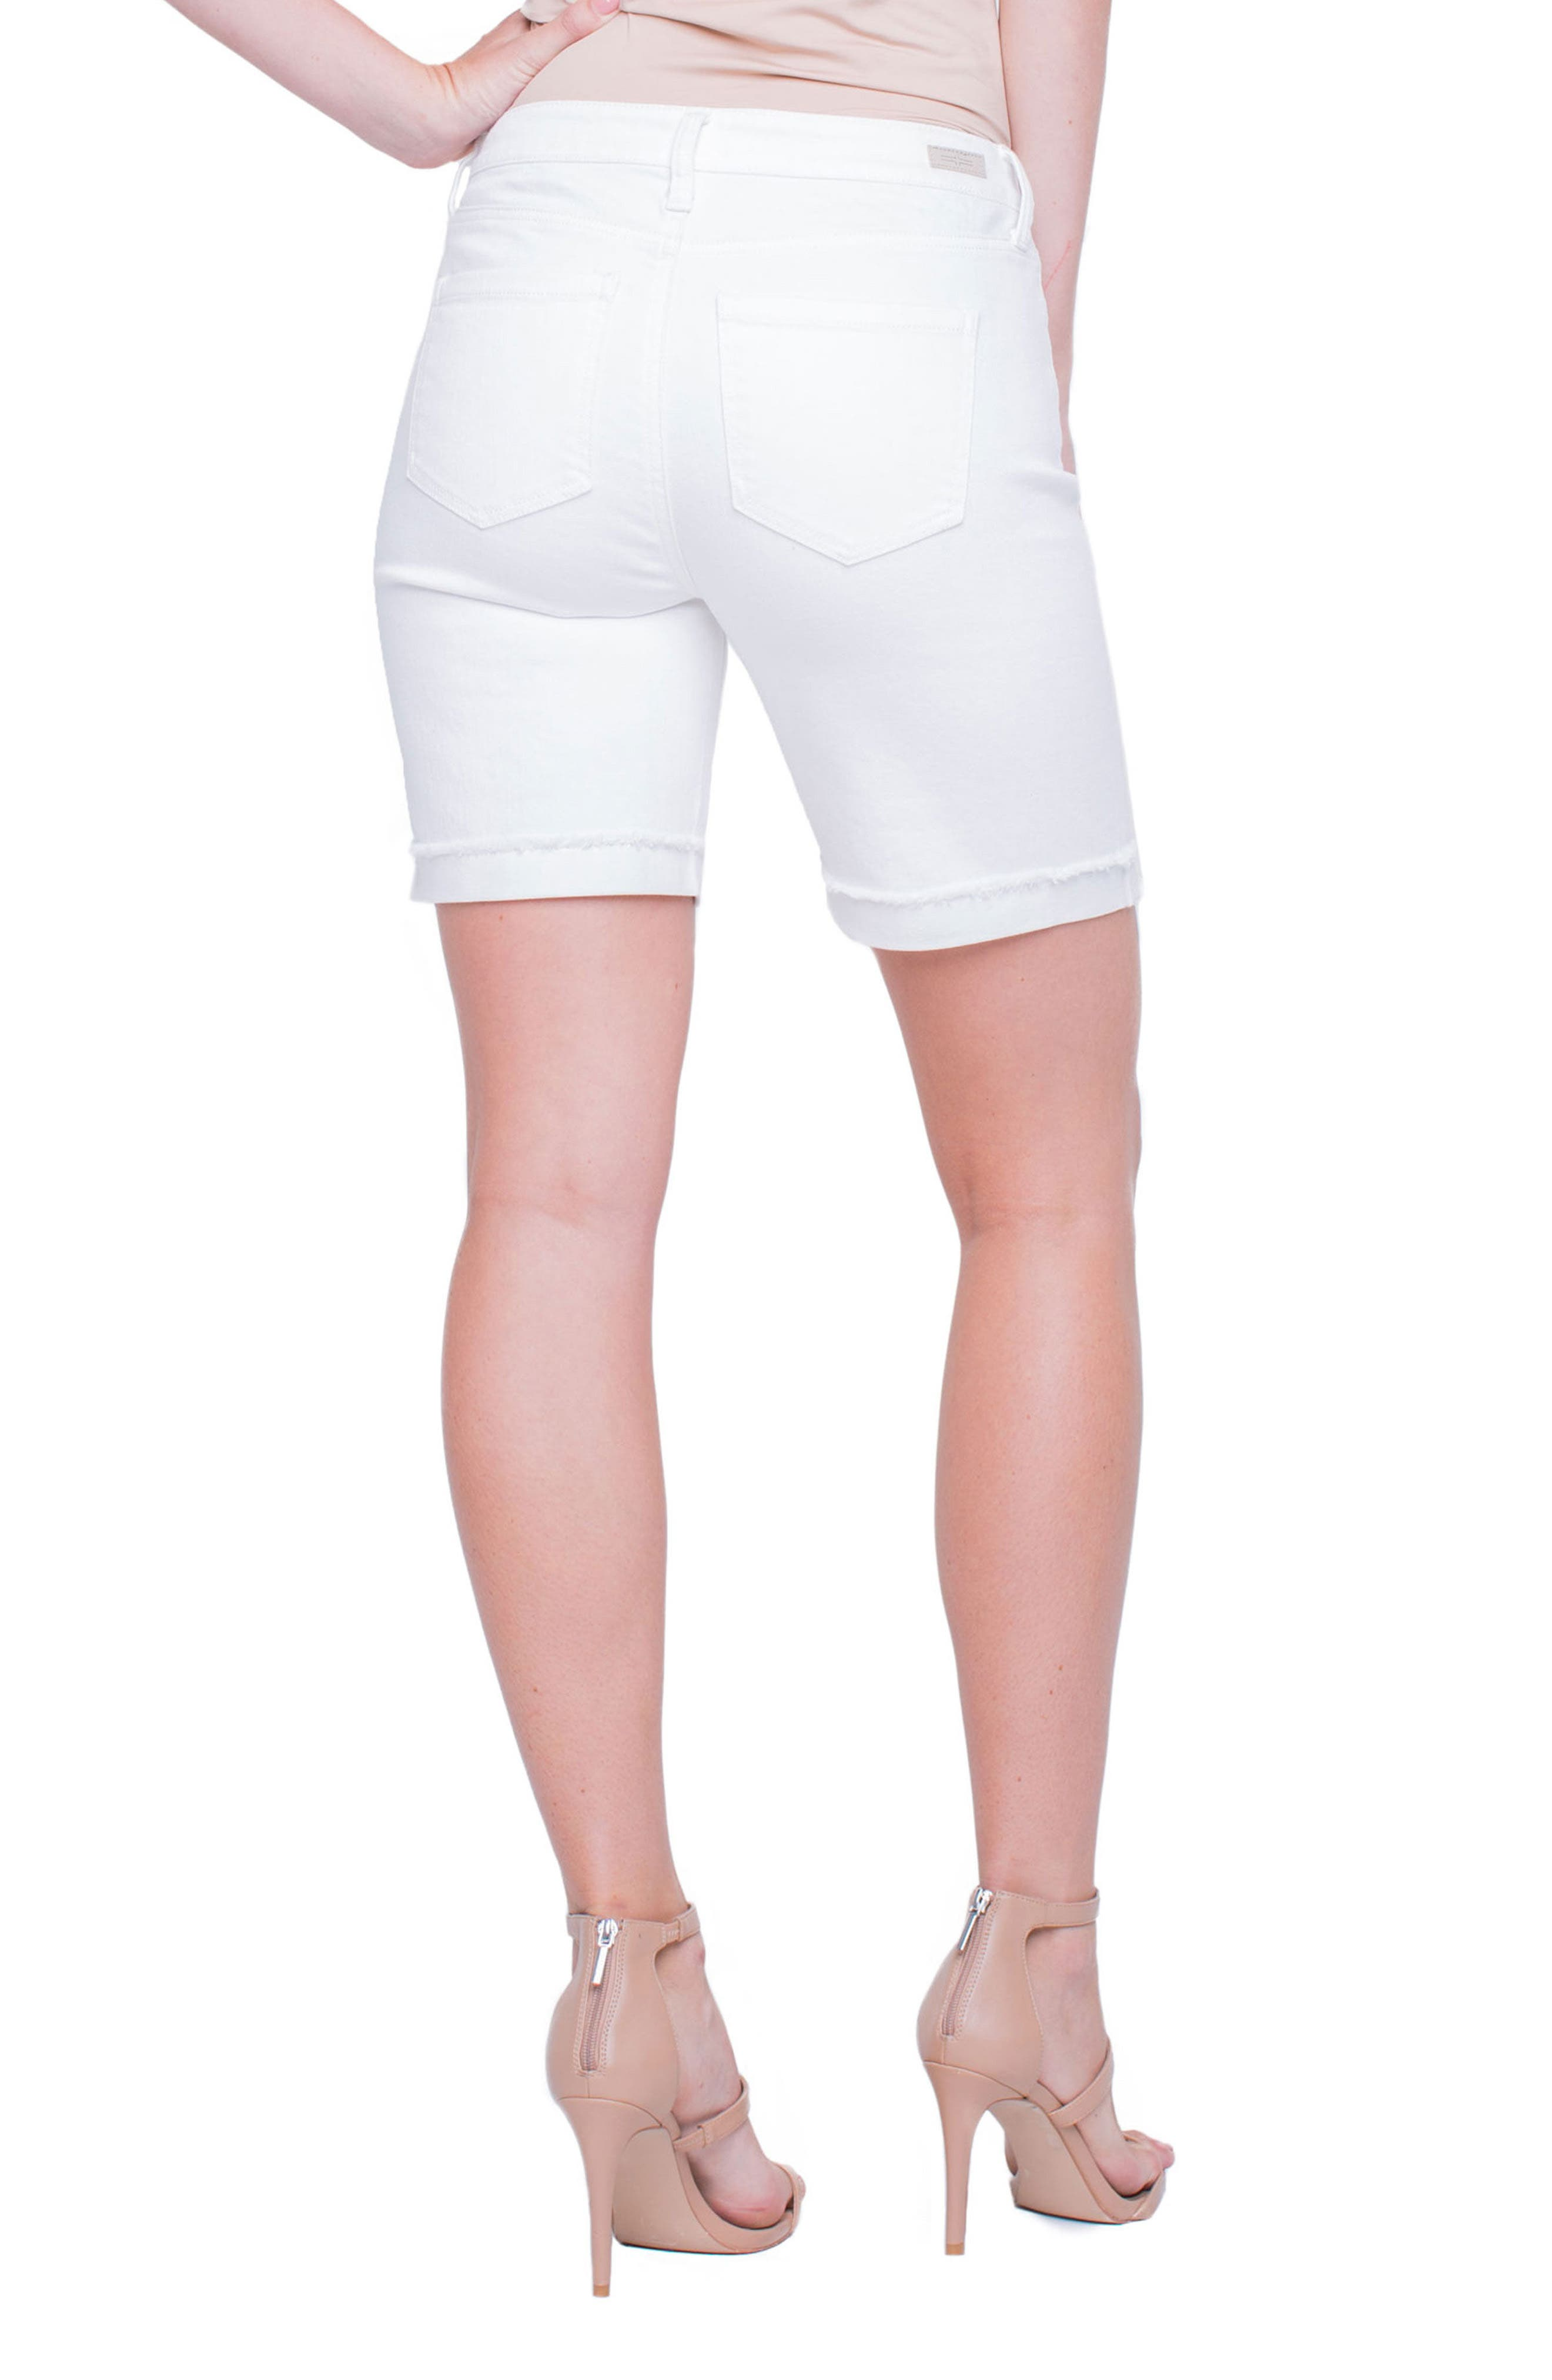 Casey White Denim Shorts,                             Alternate thumbnail 3, color,                             Bright White